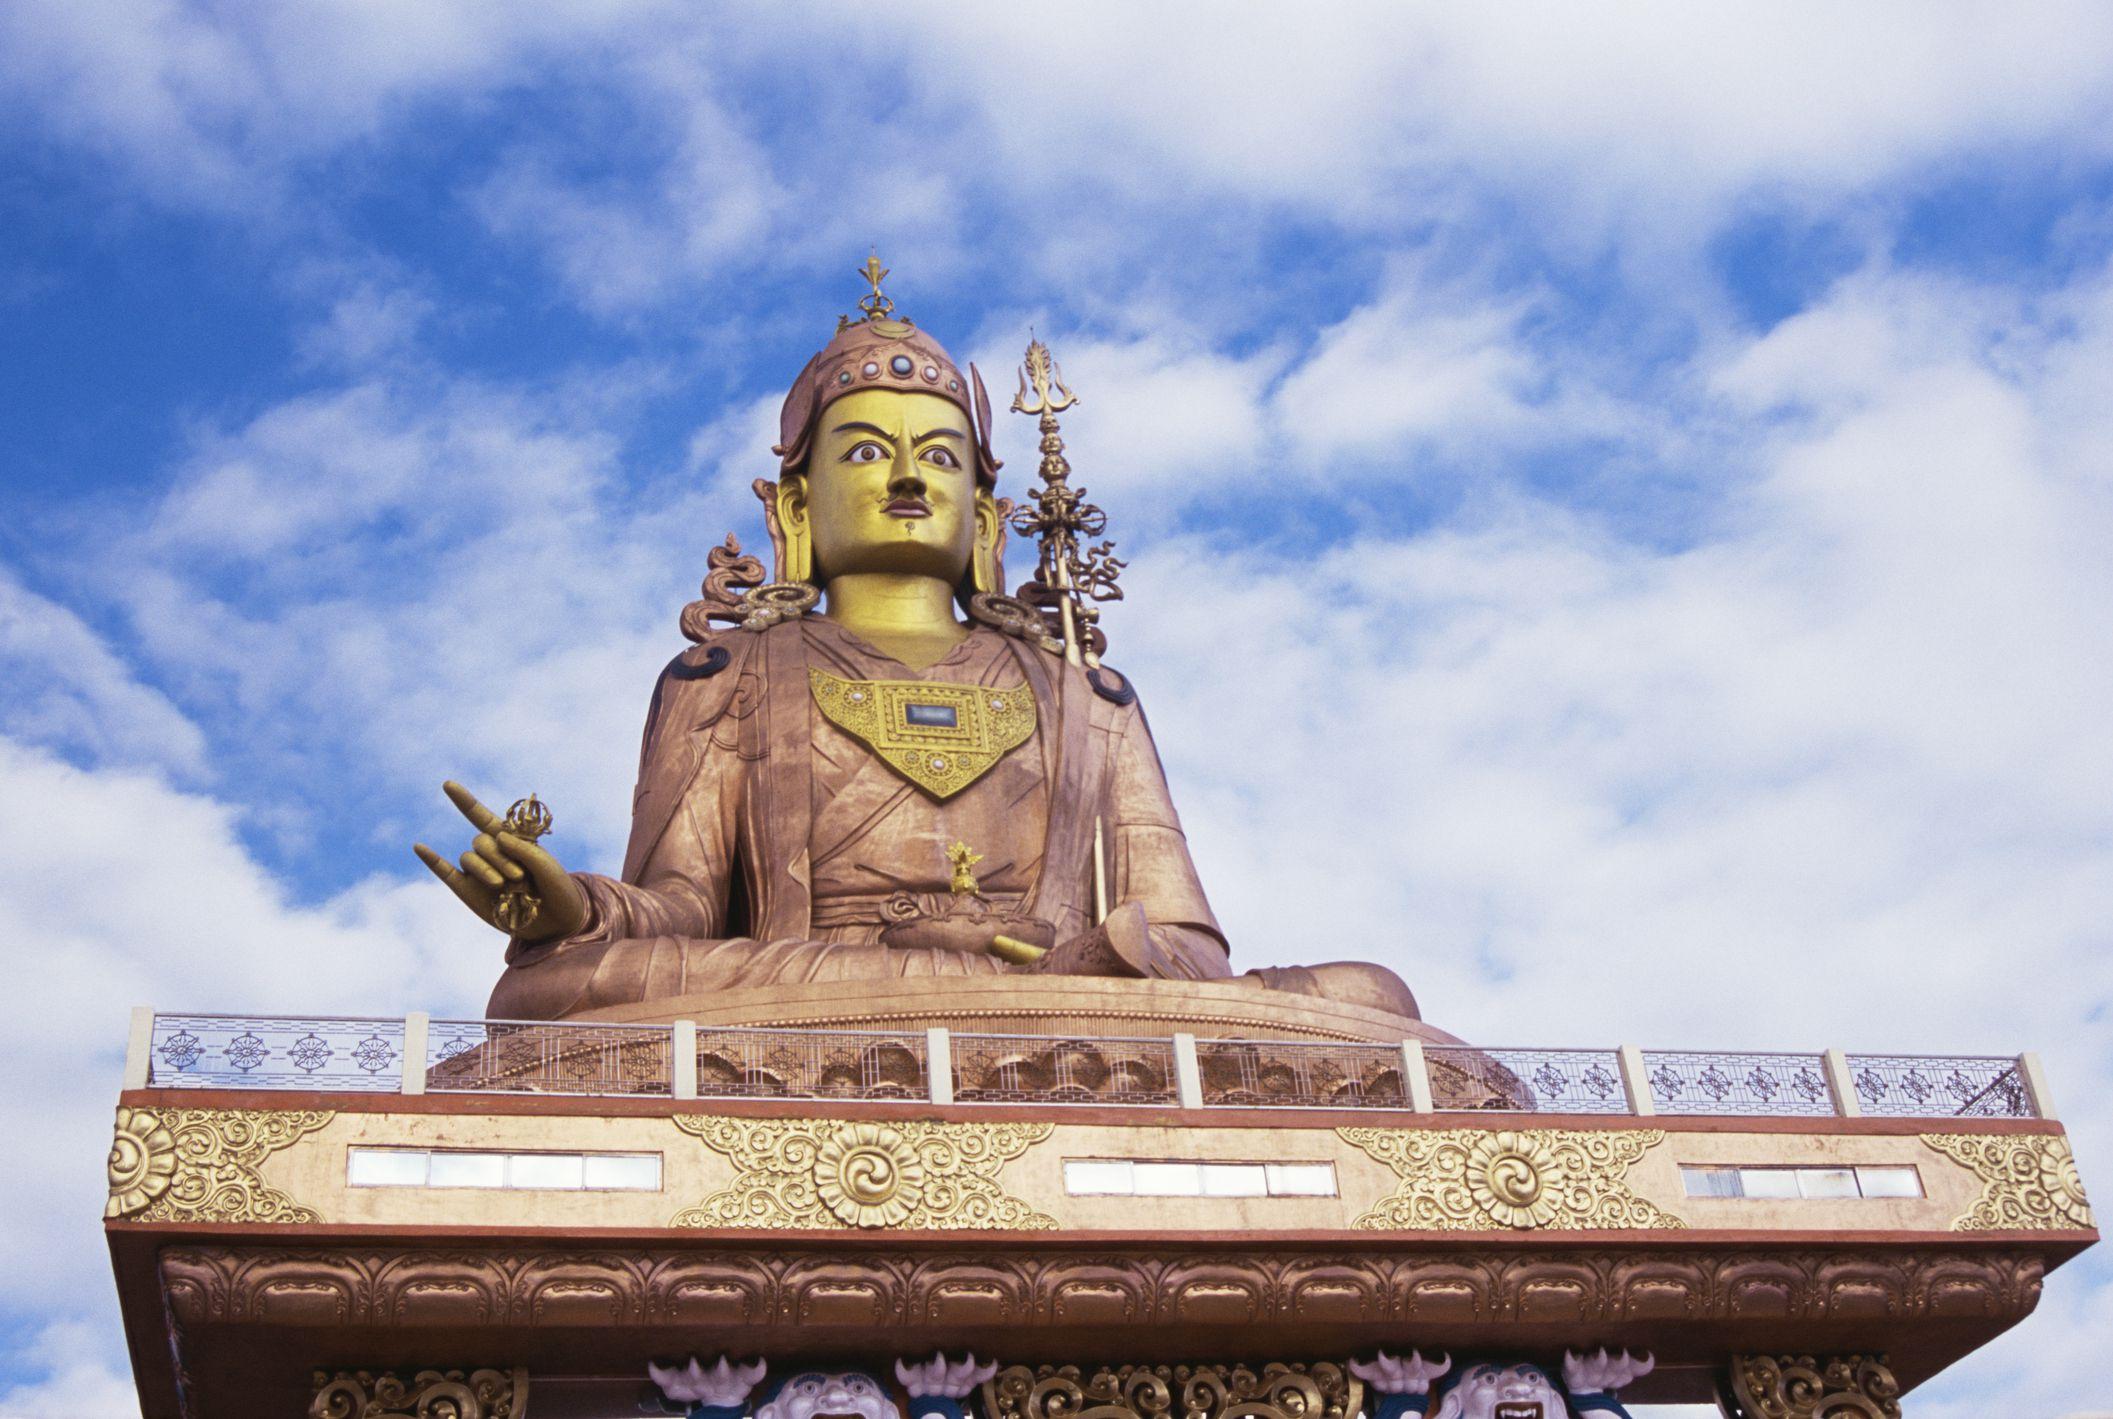 Bardo Thodol: The Tibetan Book of the Dead